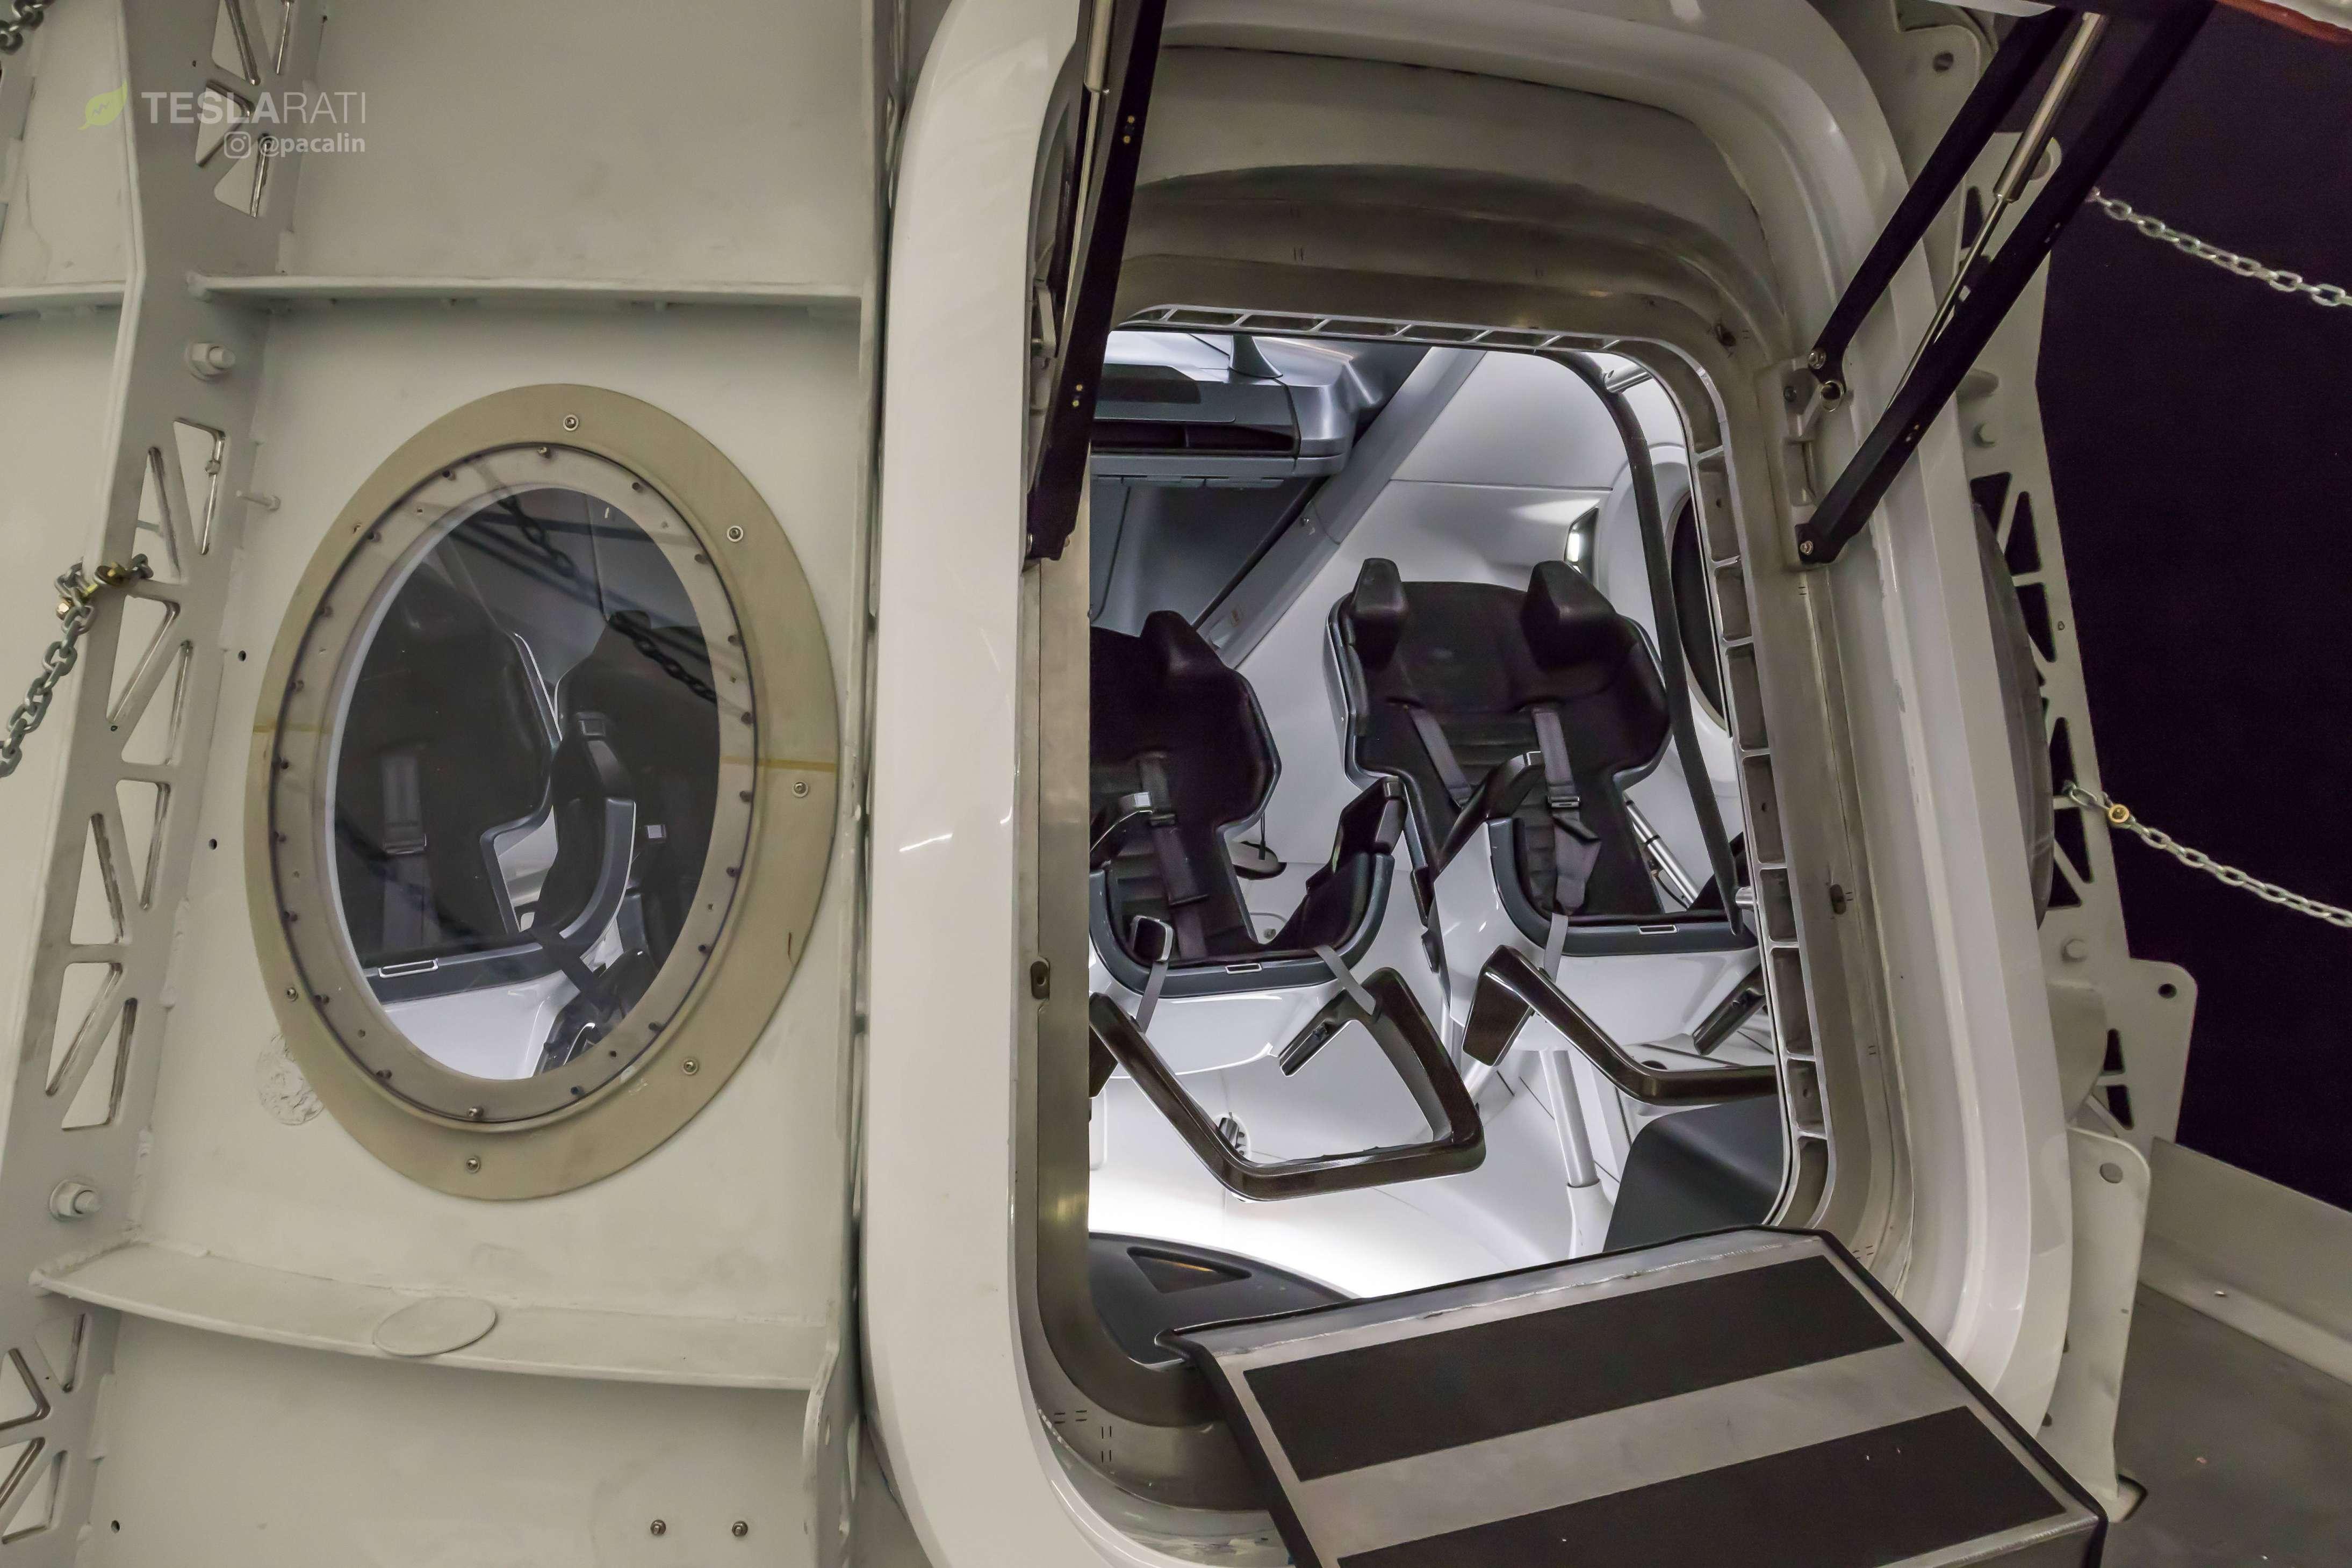 Crew-Dragon-simulator-cabin-081318-SpaceX-10-c.jpg